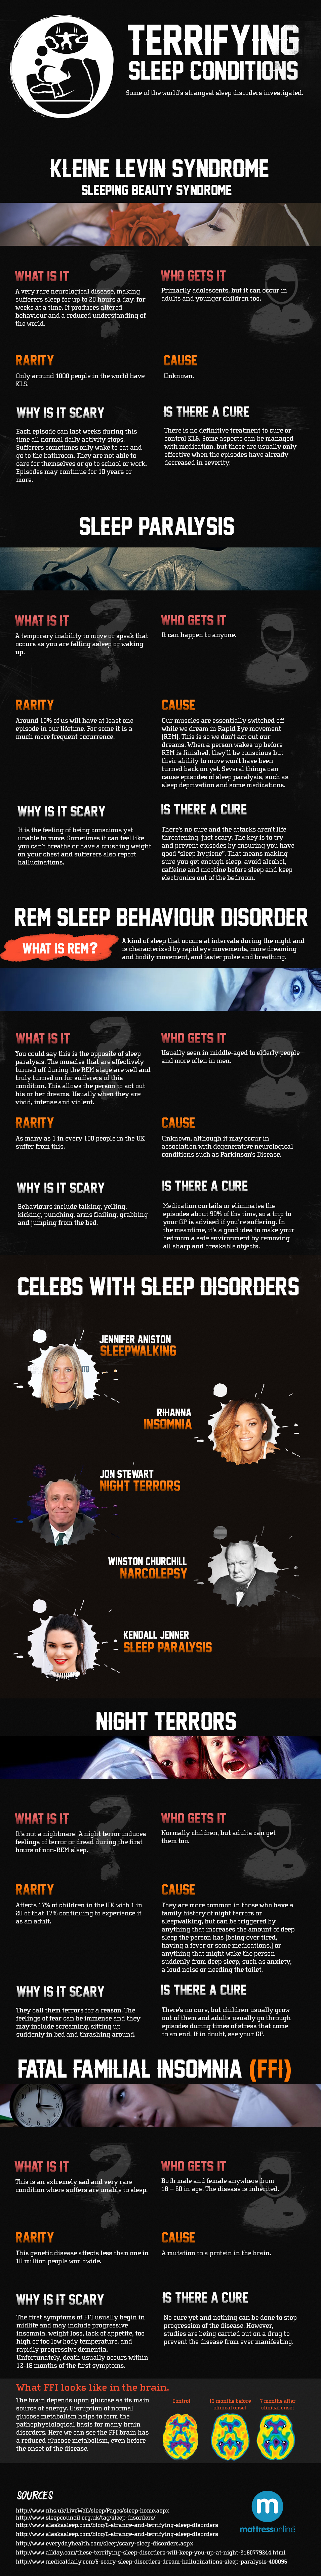 When Sleep Terrorizes and Paralyzes: 5 Sleep Disorders - Infographic